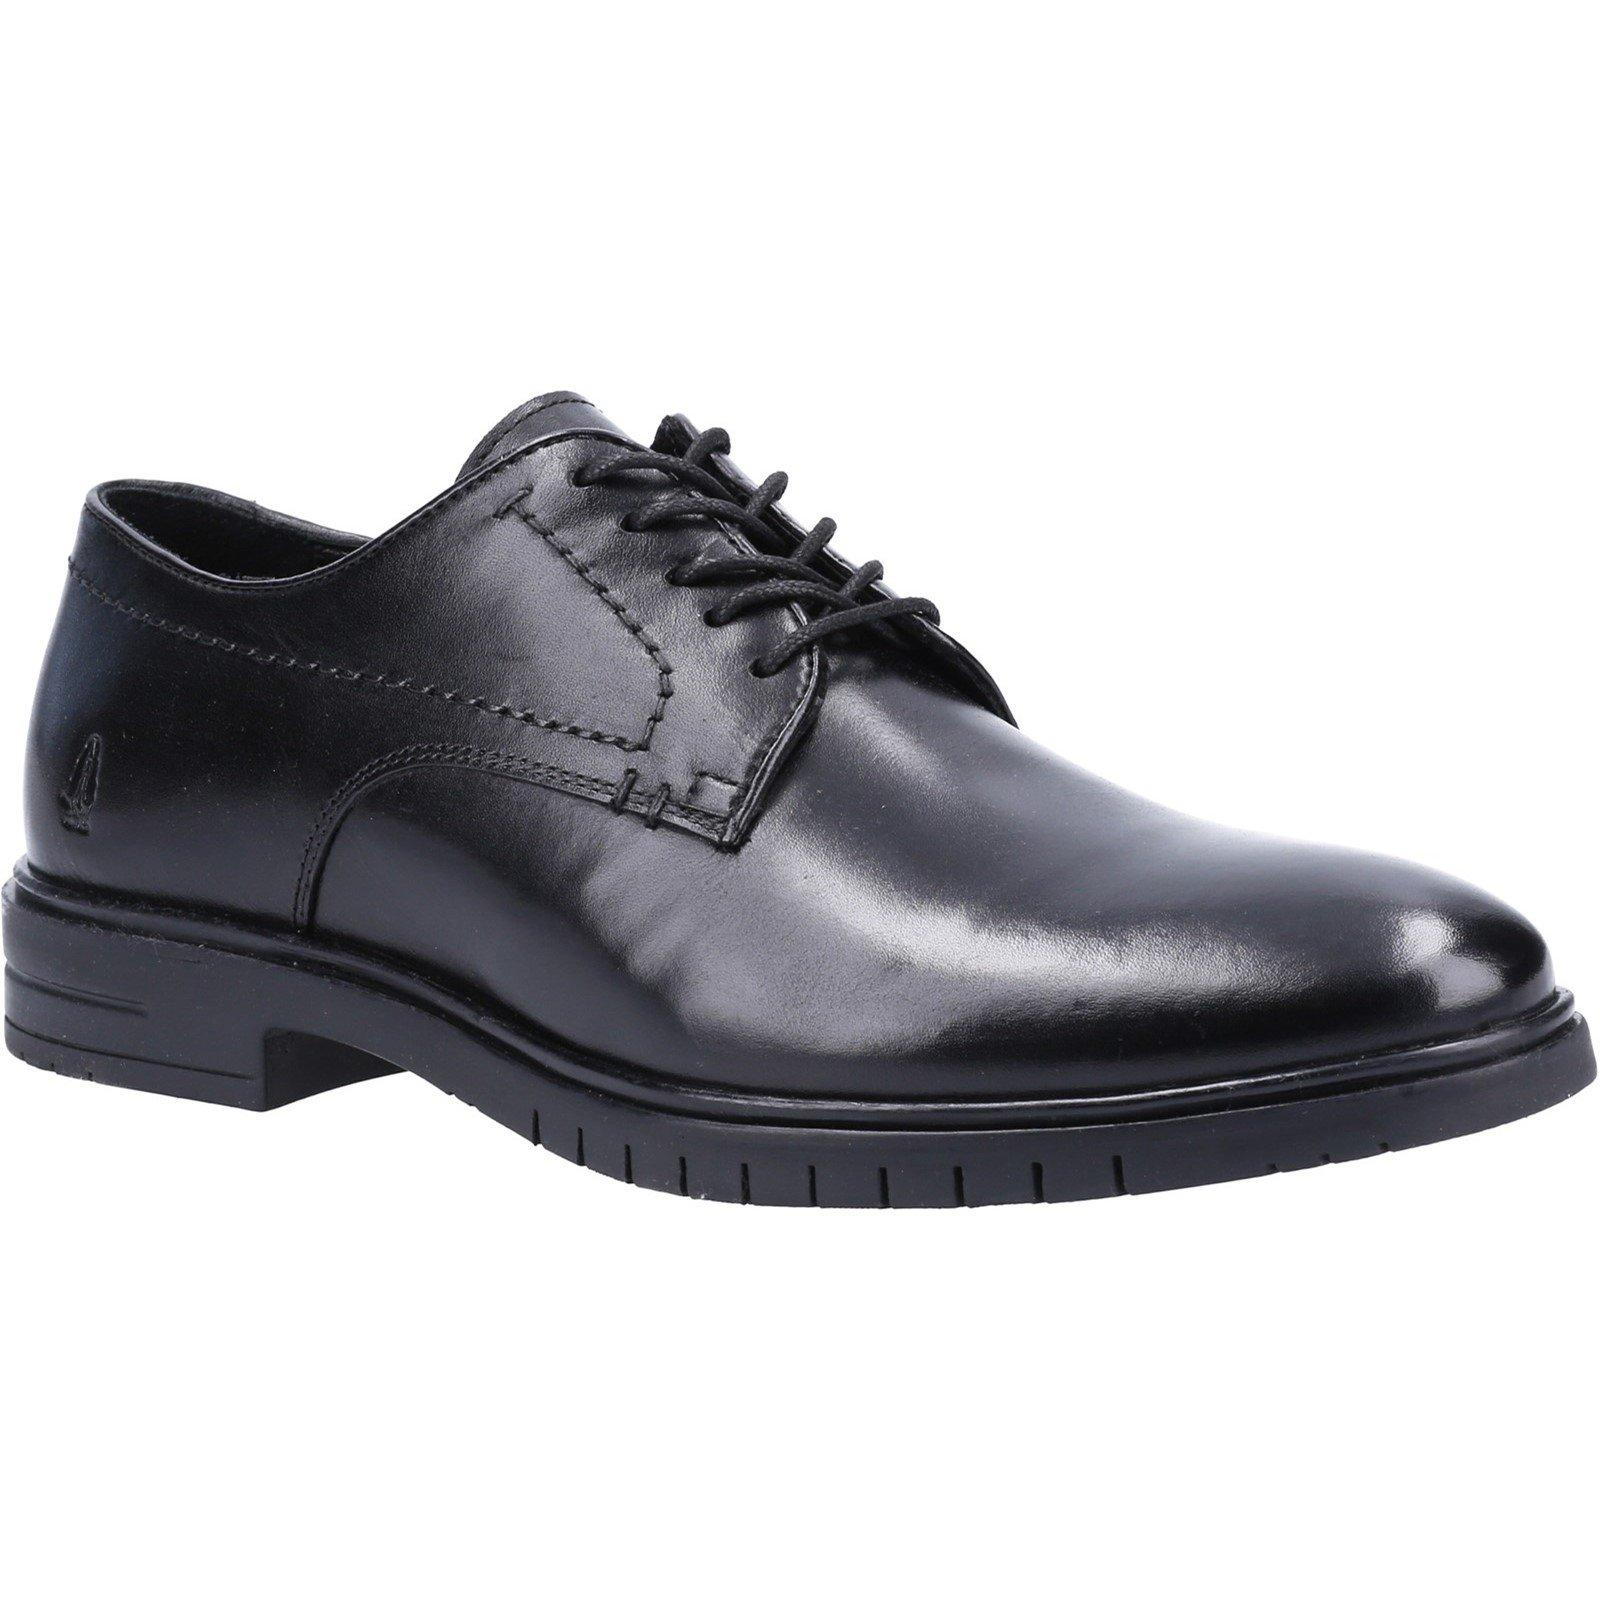 Hush Puppies Men's Sterling Lace Derby Shoe Black 31992 - Black 12